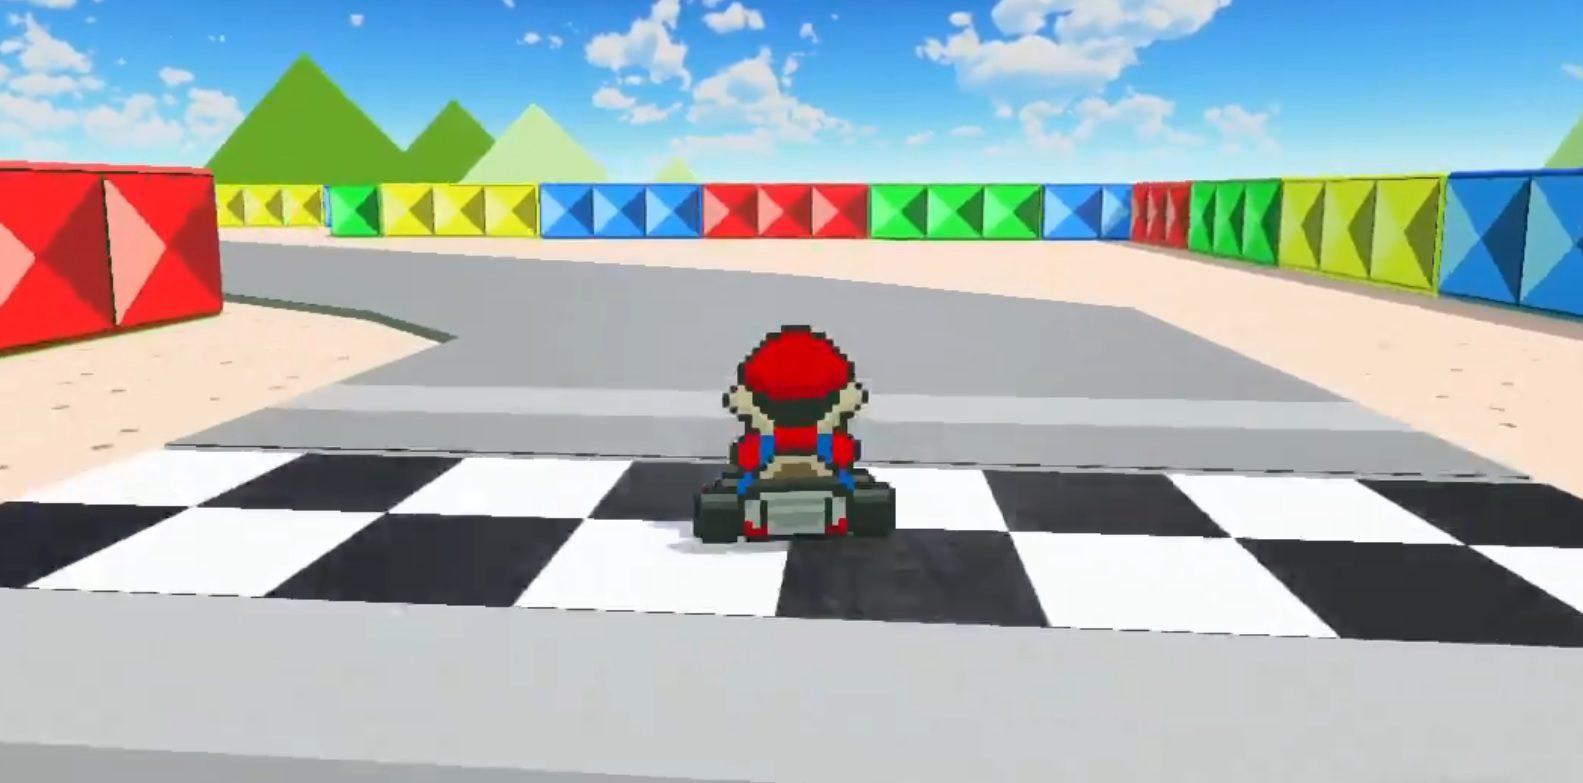 A recreation of Mario Kart in Game Builder Garage